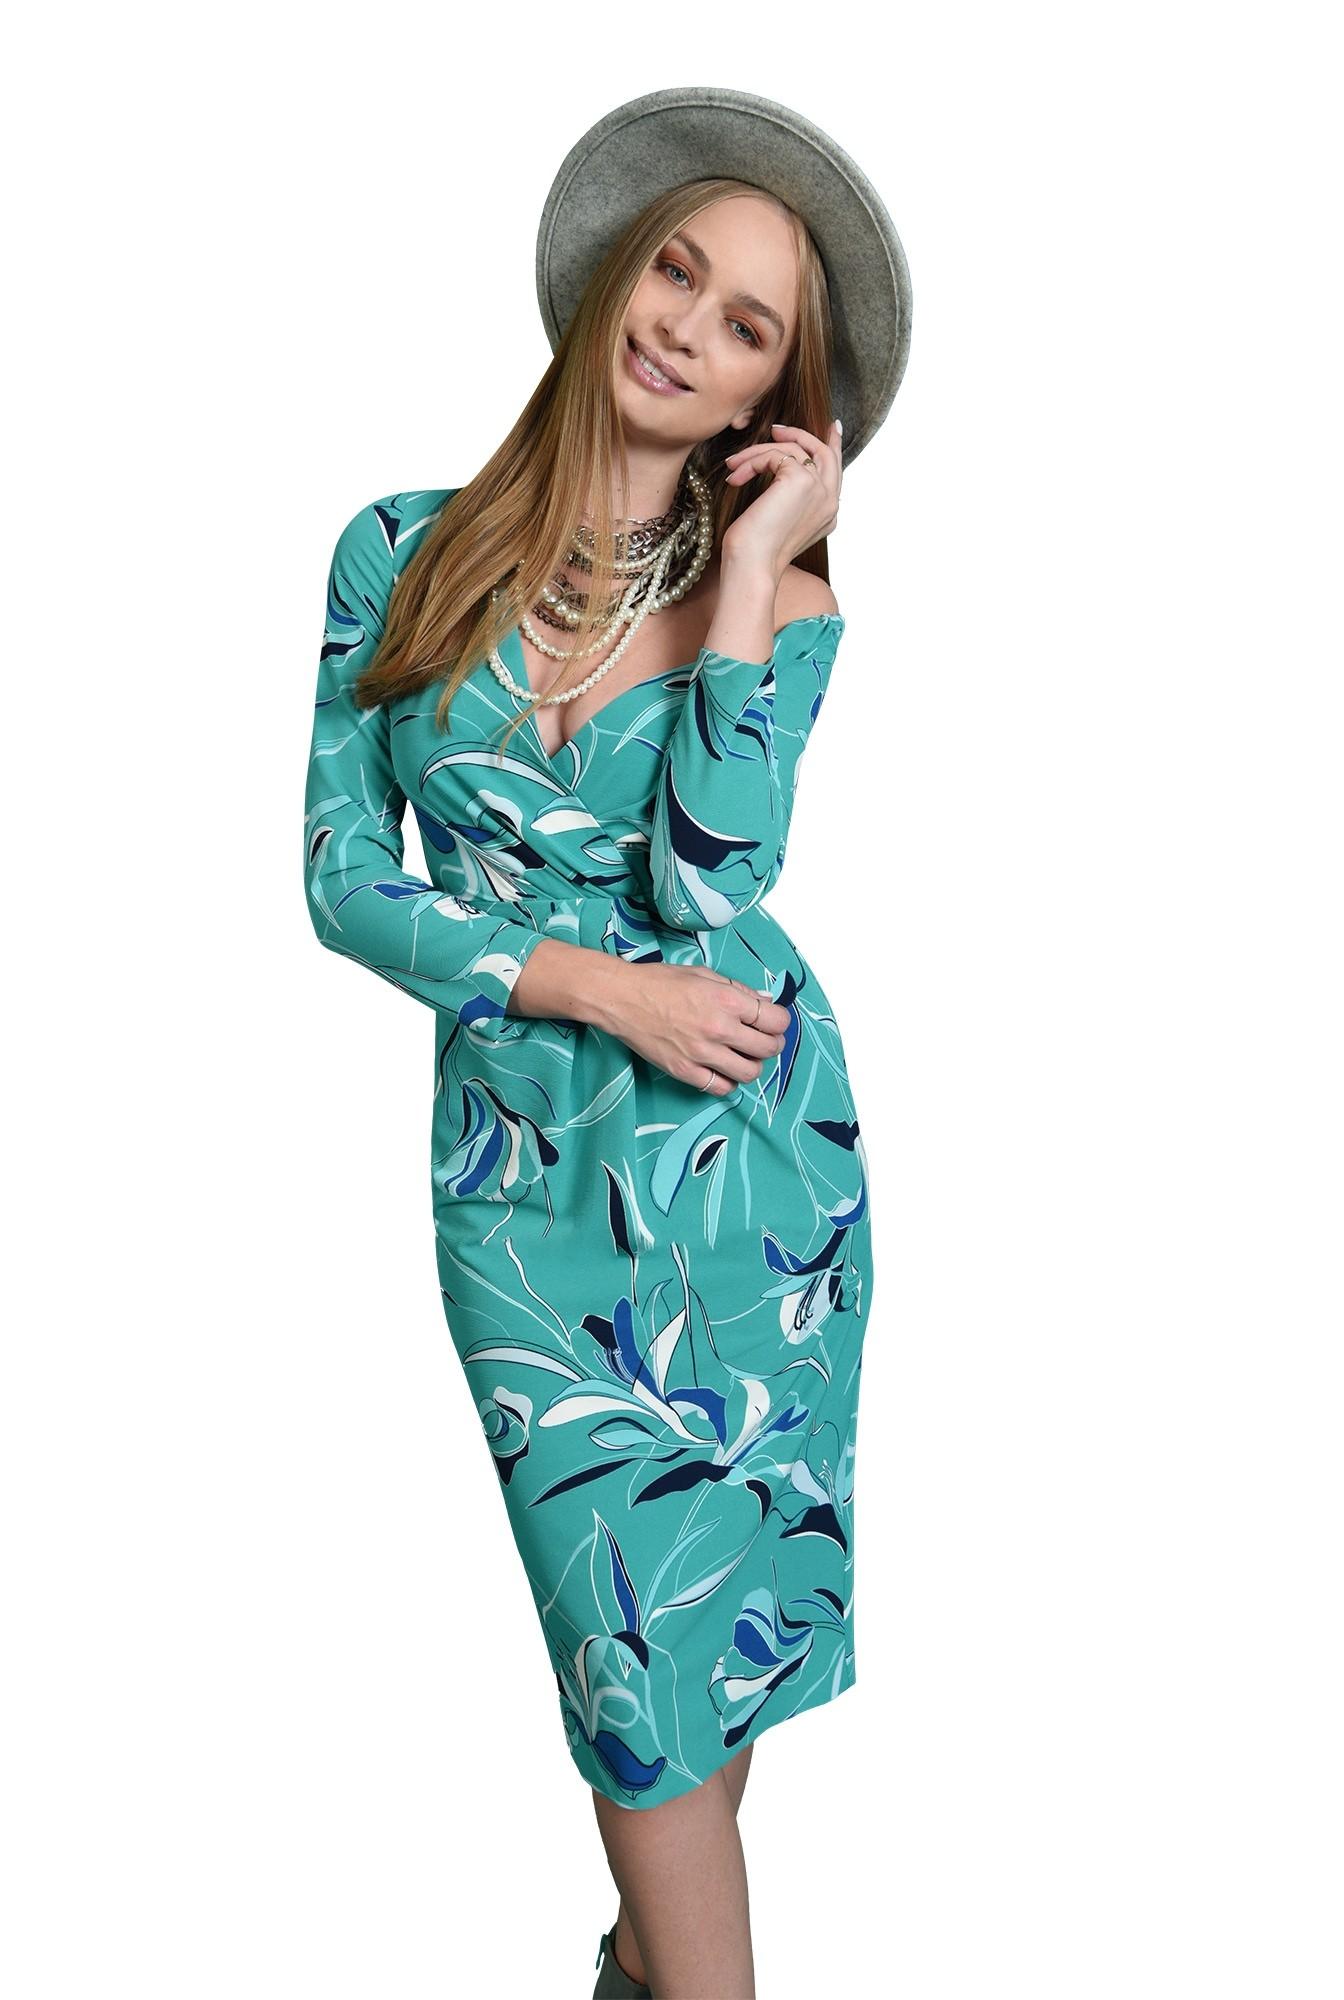 3 - rochie eleganta, turcoaz, cu pliuri